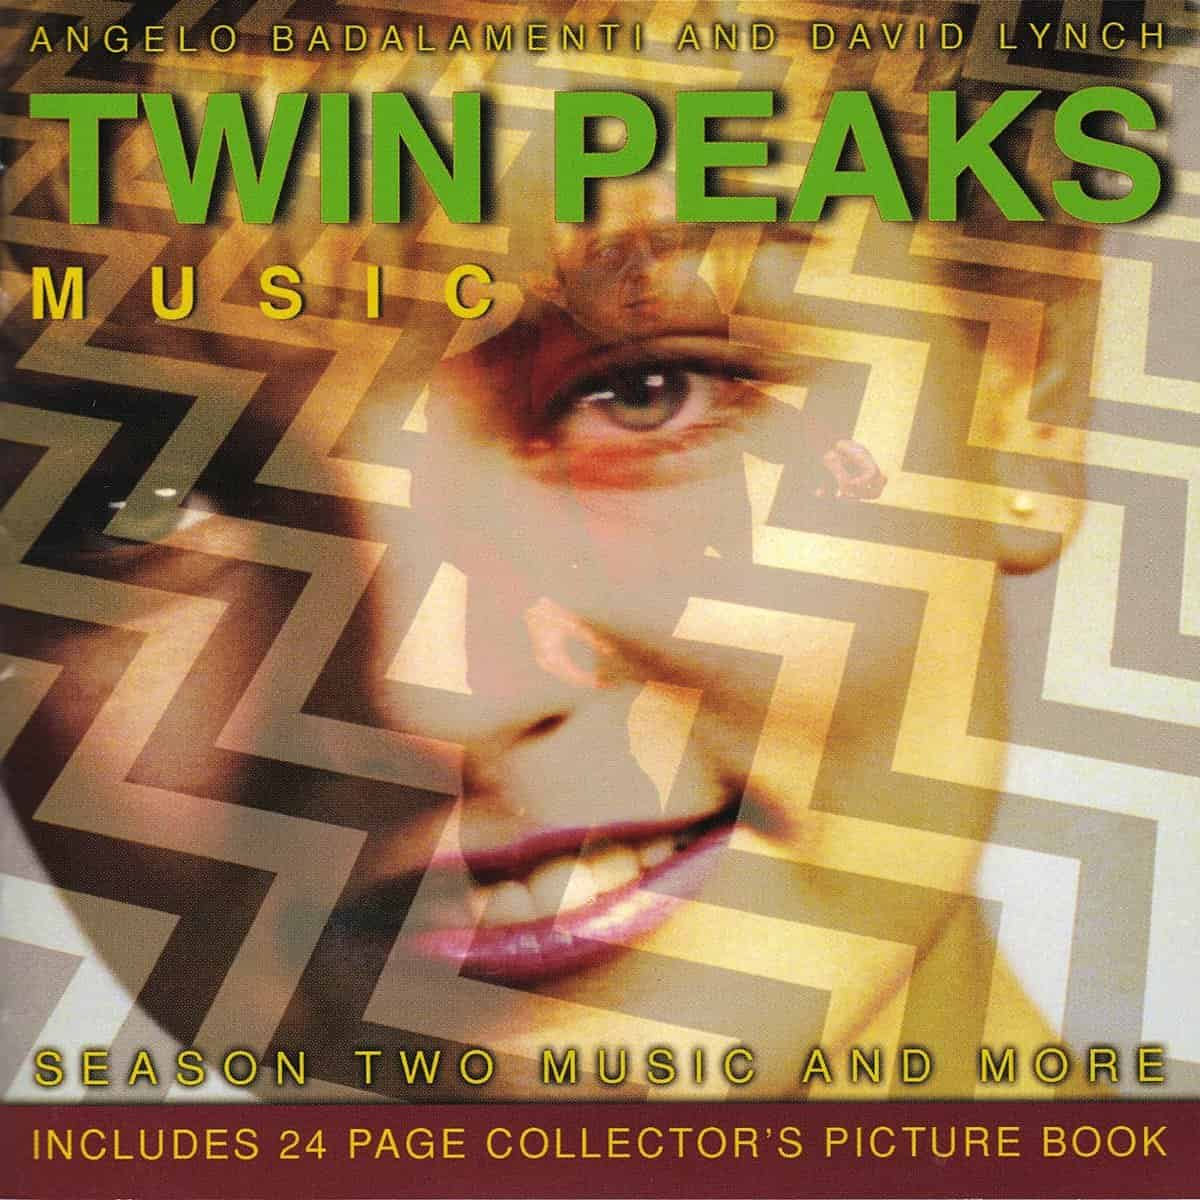 Download The Tweinc Season: Twin Peaks Season Two Music And More